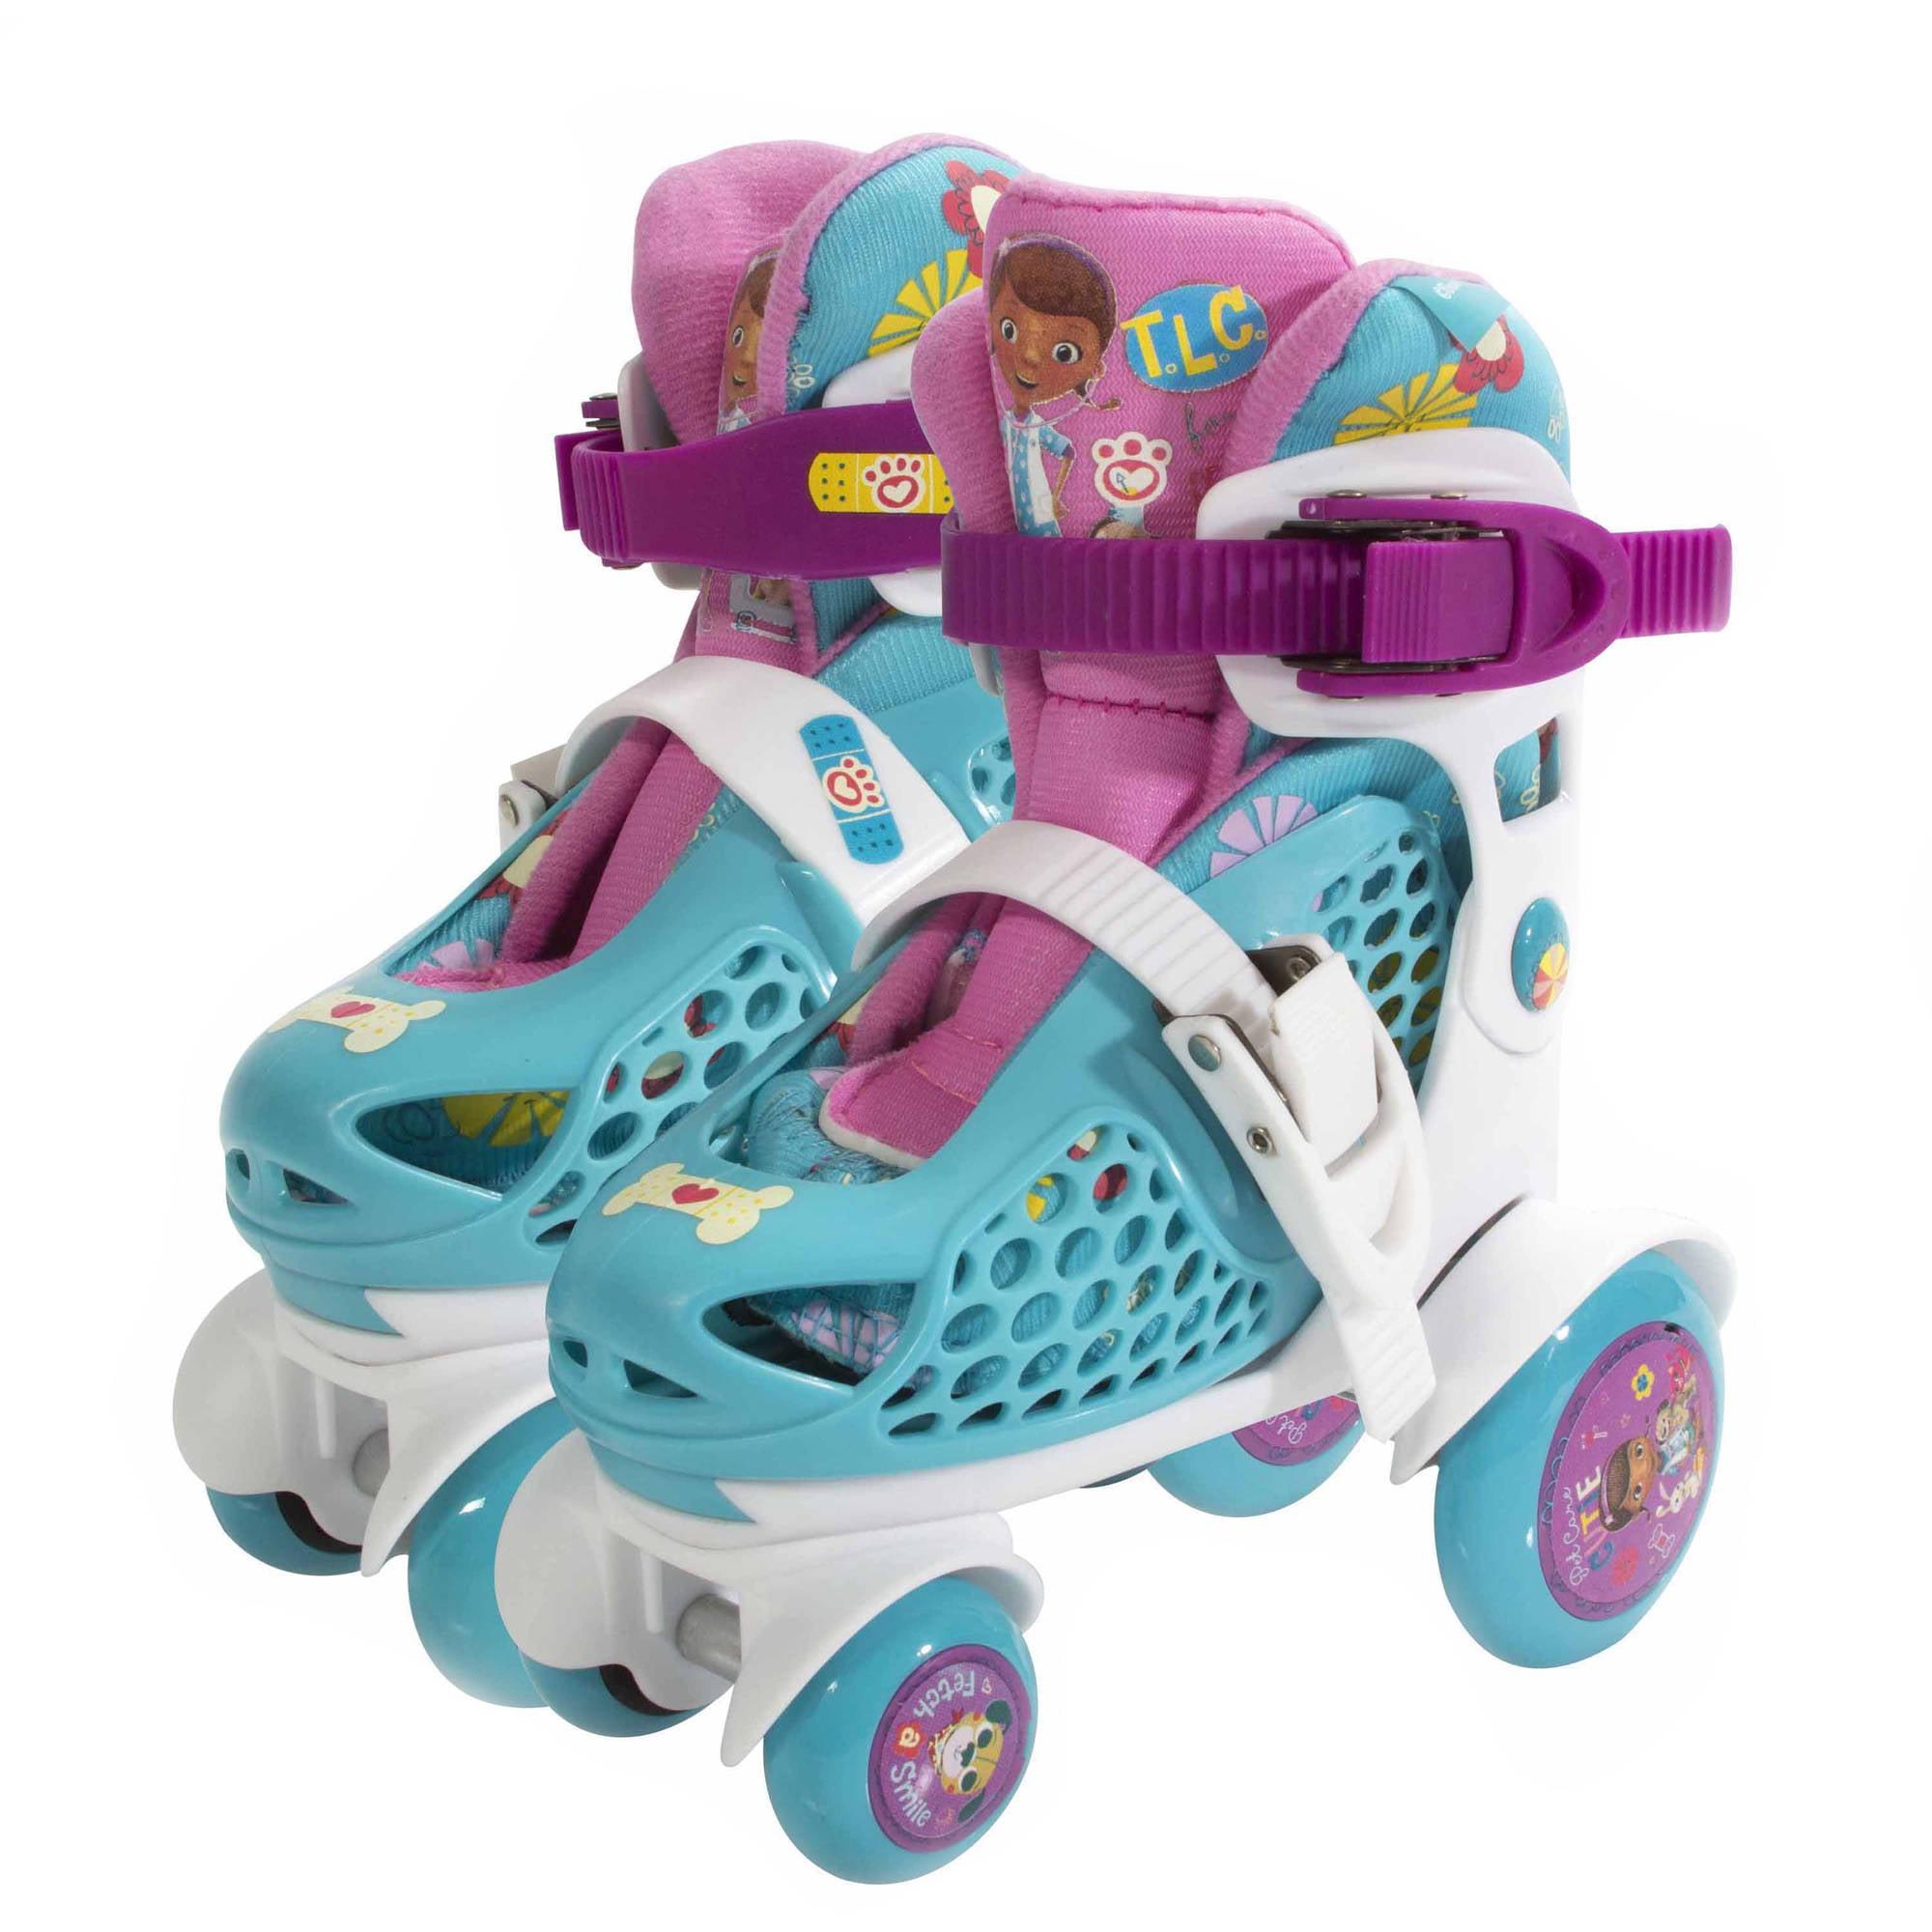 Roller skate shoes walmart - Playwheels Disney Doc Mcstuffins Big Wheel Skate Junior Size 6 9